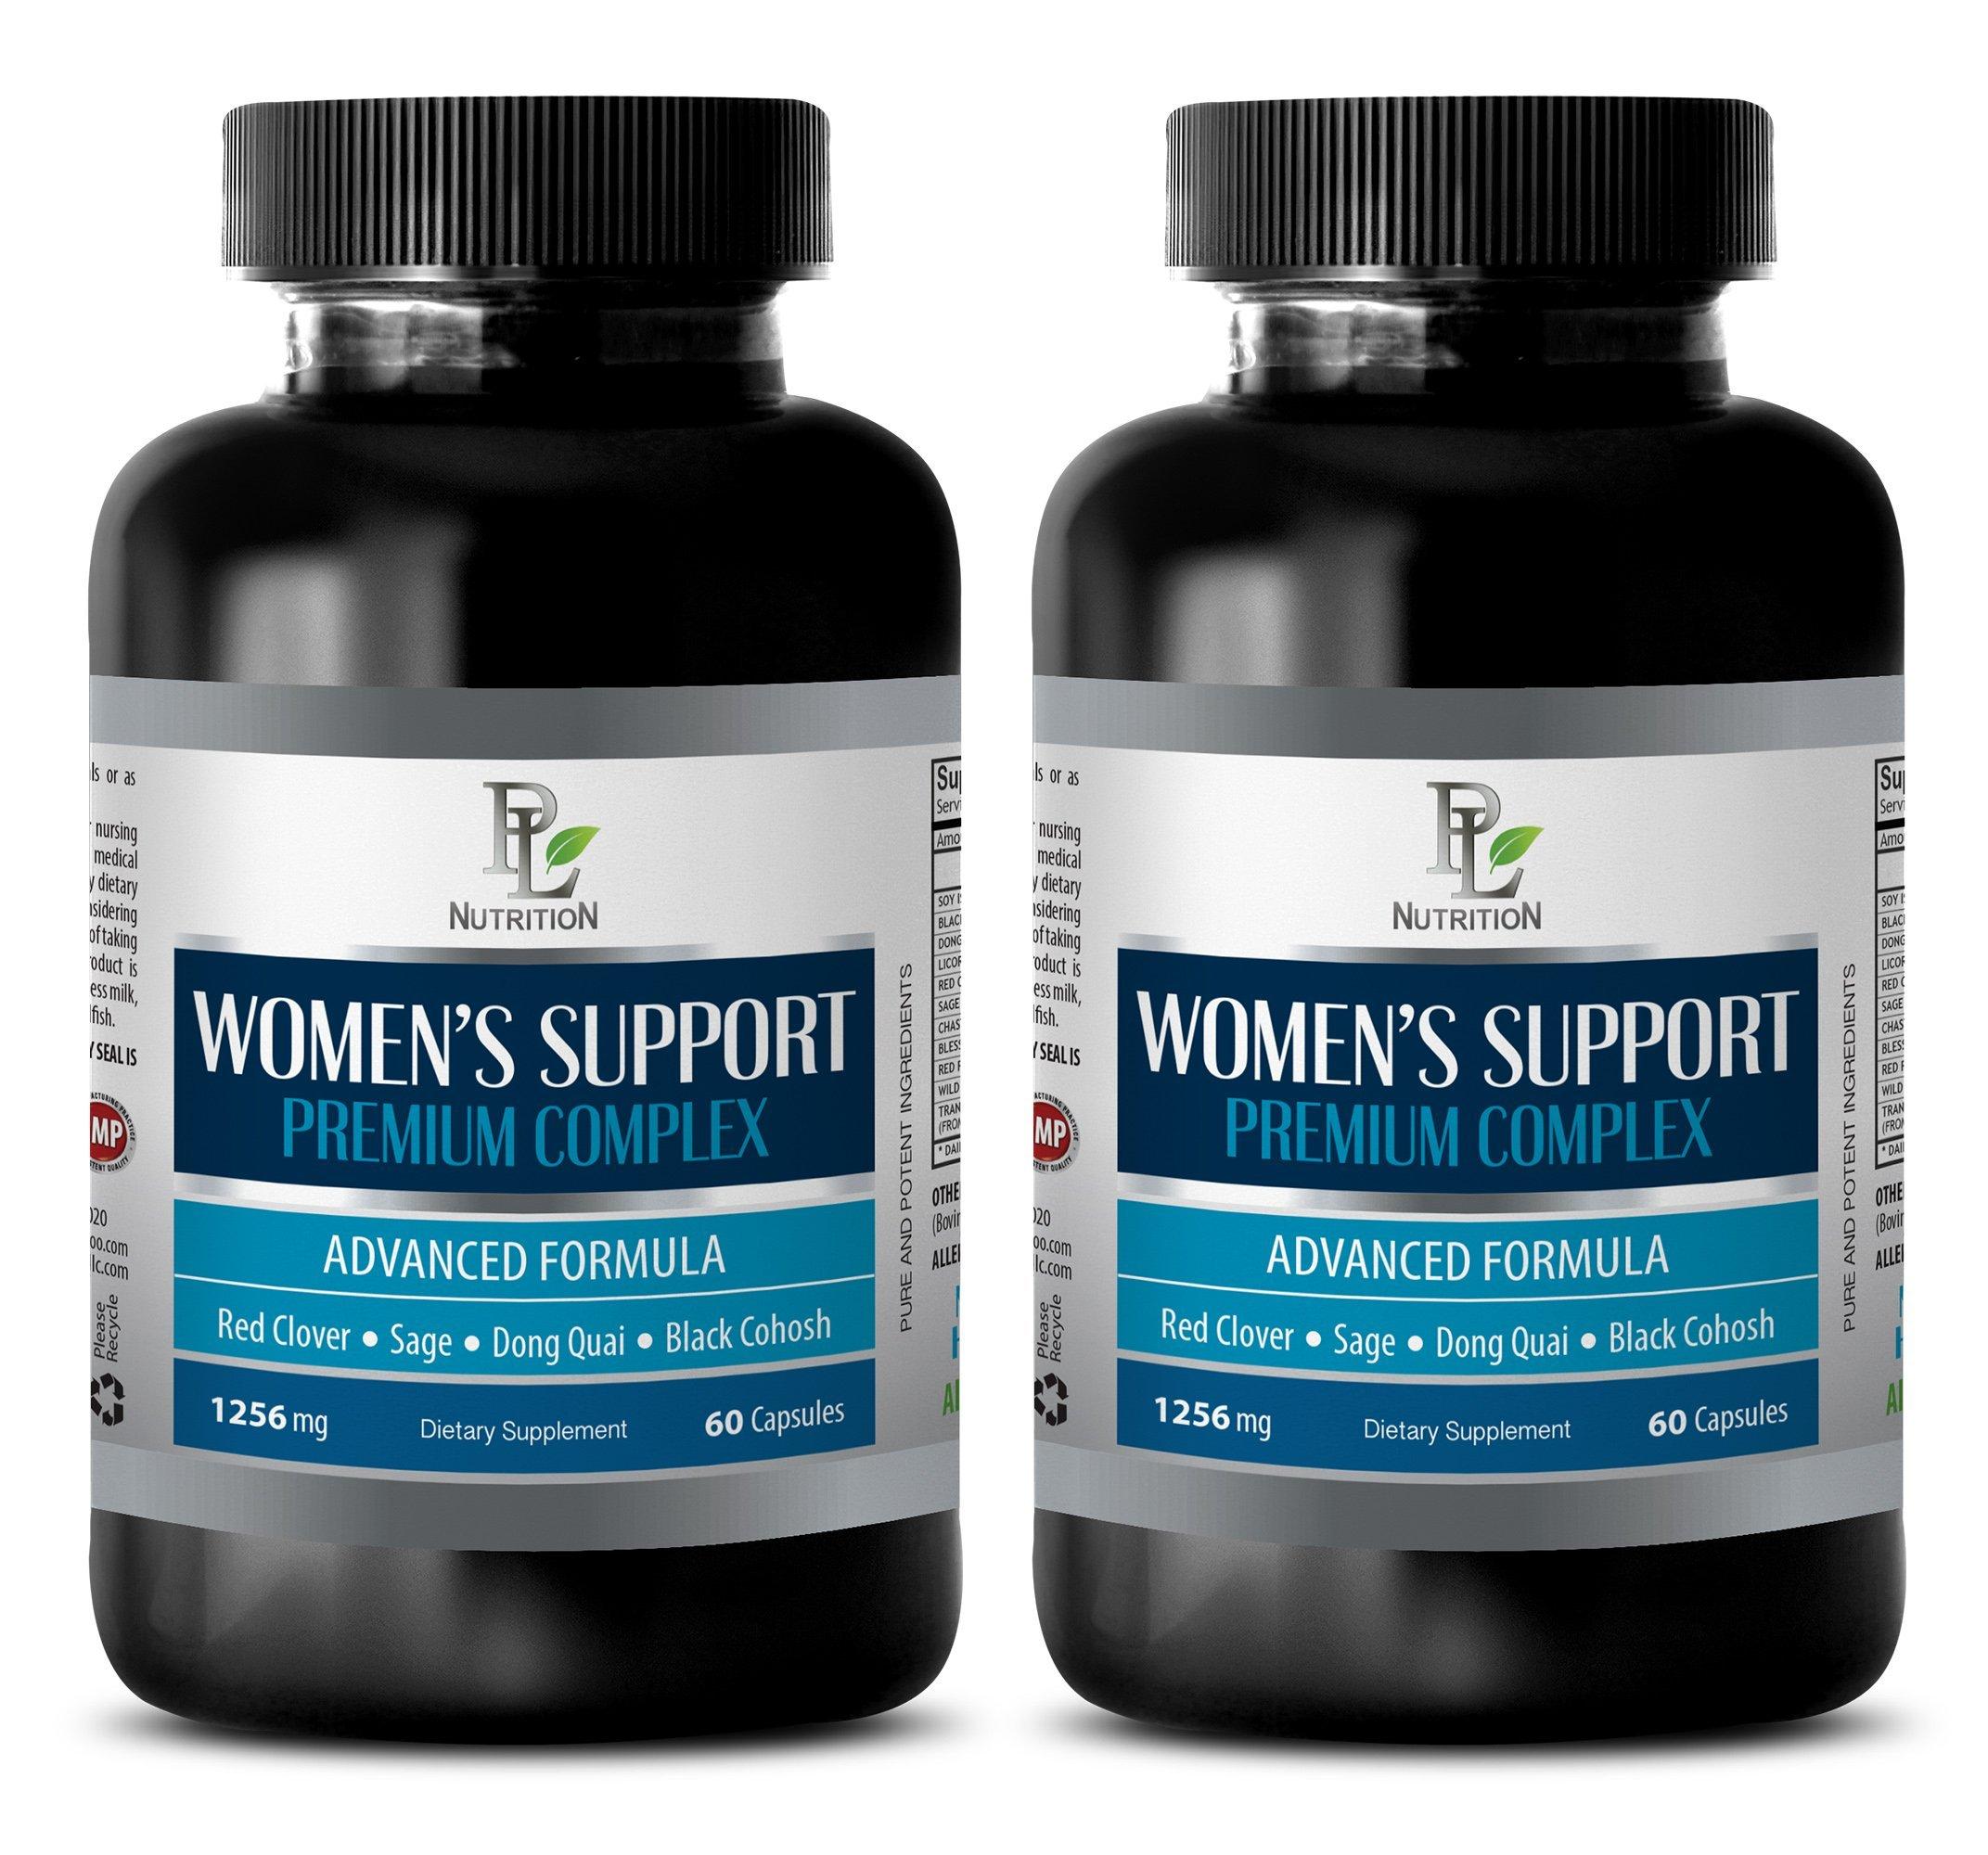 Immune Support for Women - Women's Support Premium Complex - Advanced Formula - Wellness Essentials Women - 2 Bottles (120 Capsules)